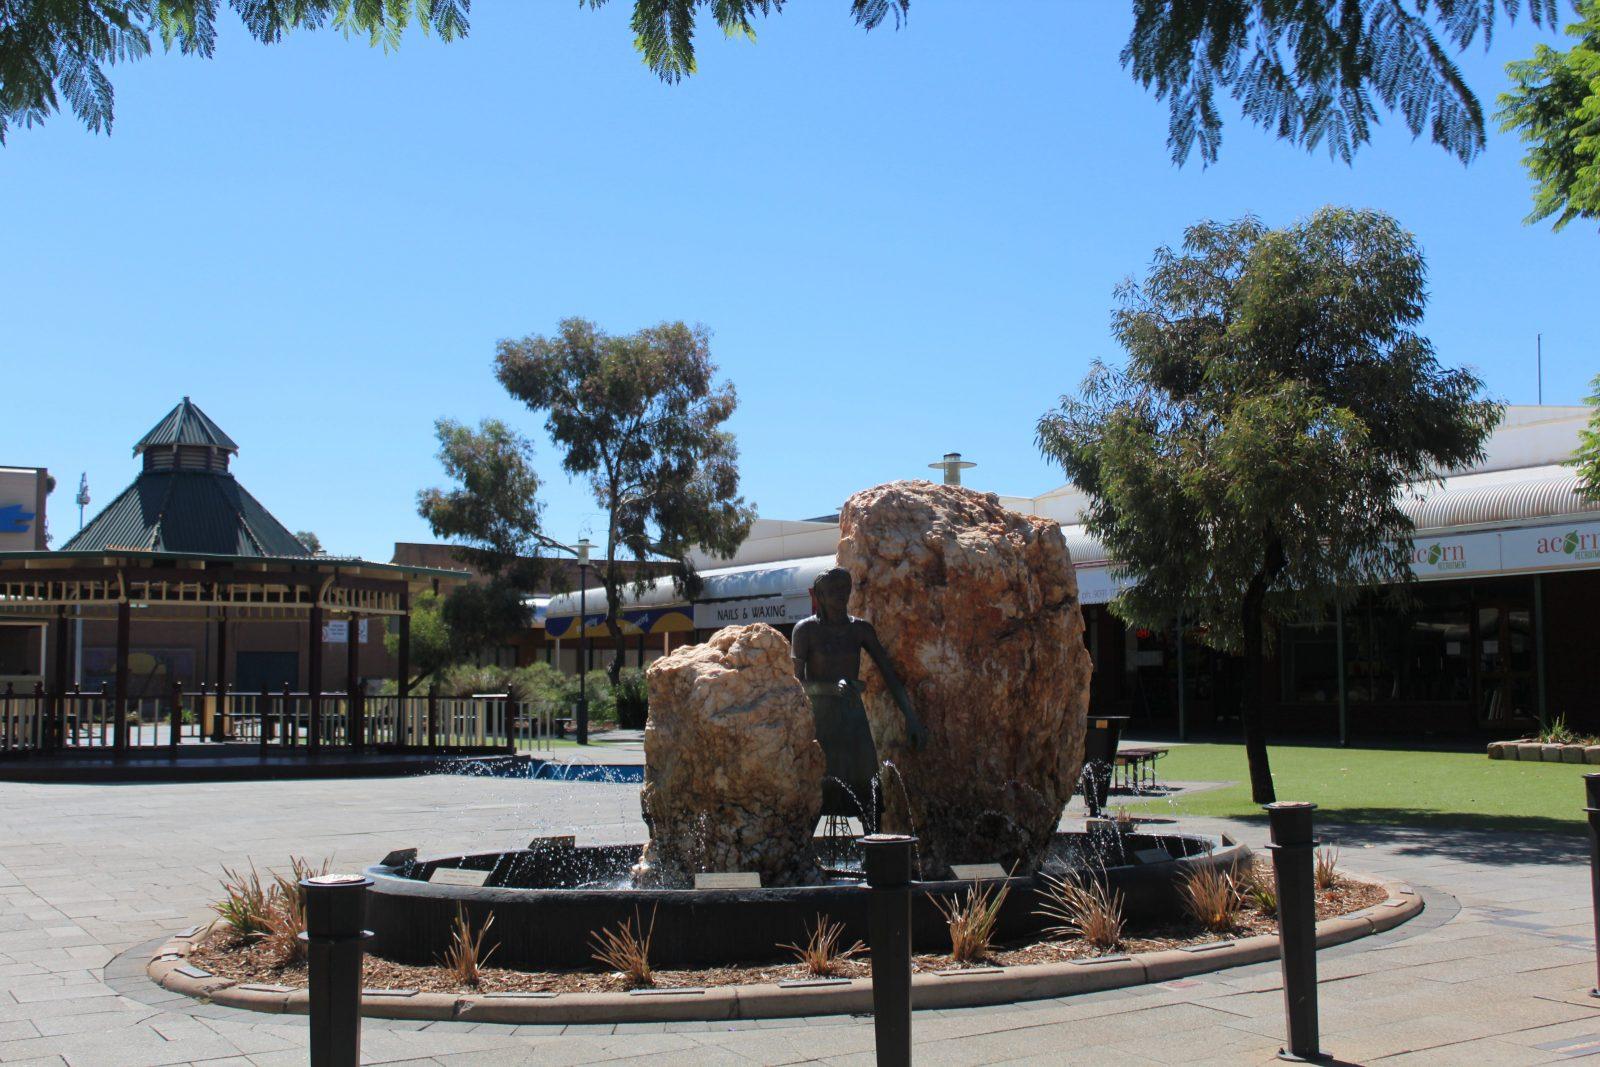 St Barbara Monument and Statue, Kalgoorlie, Western Australia